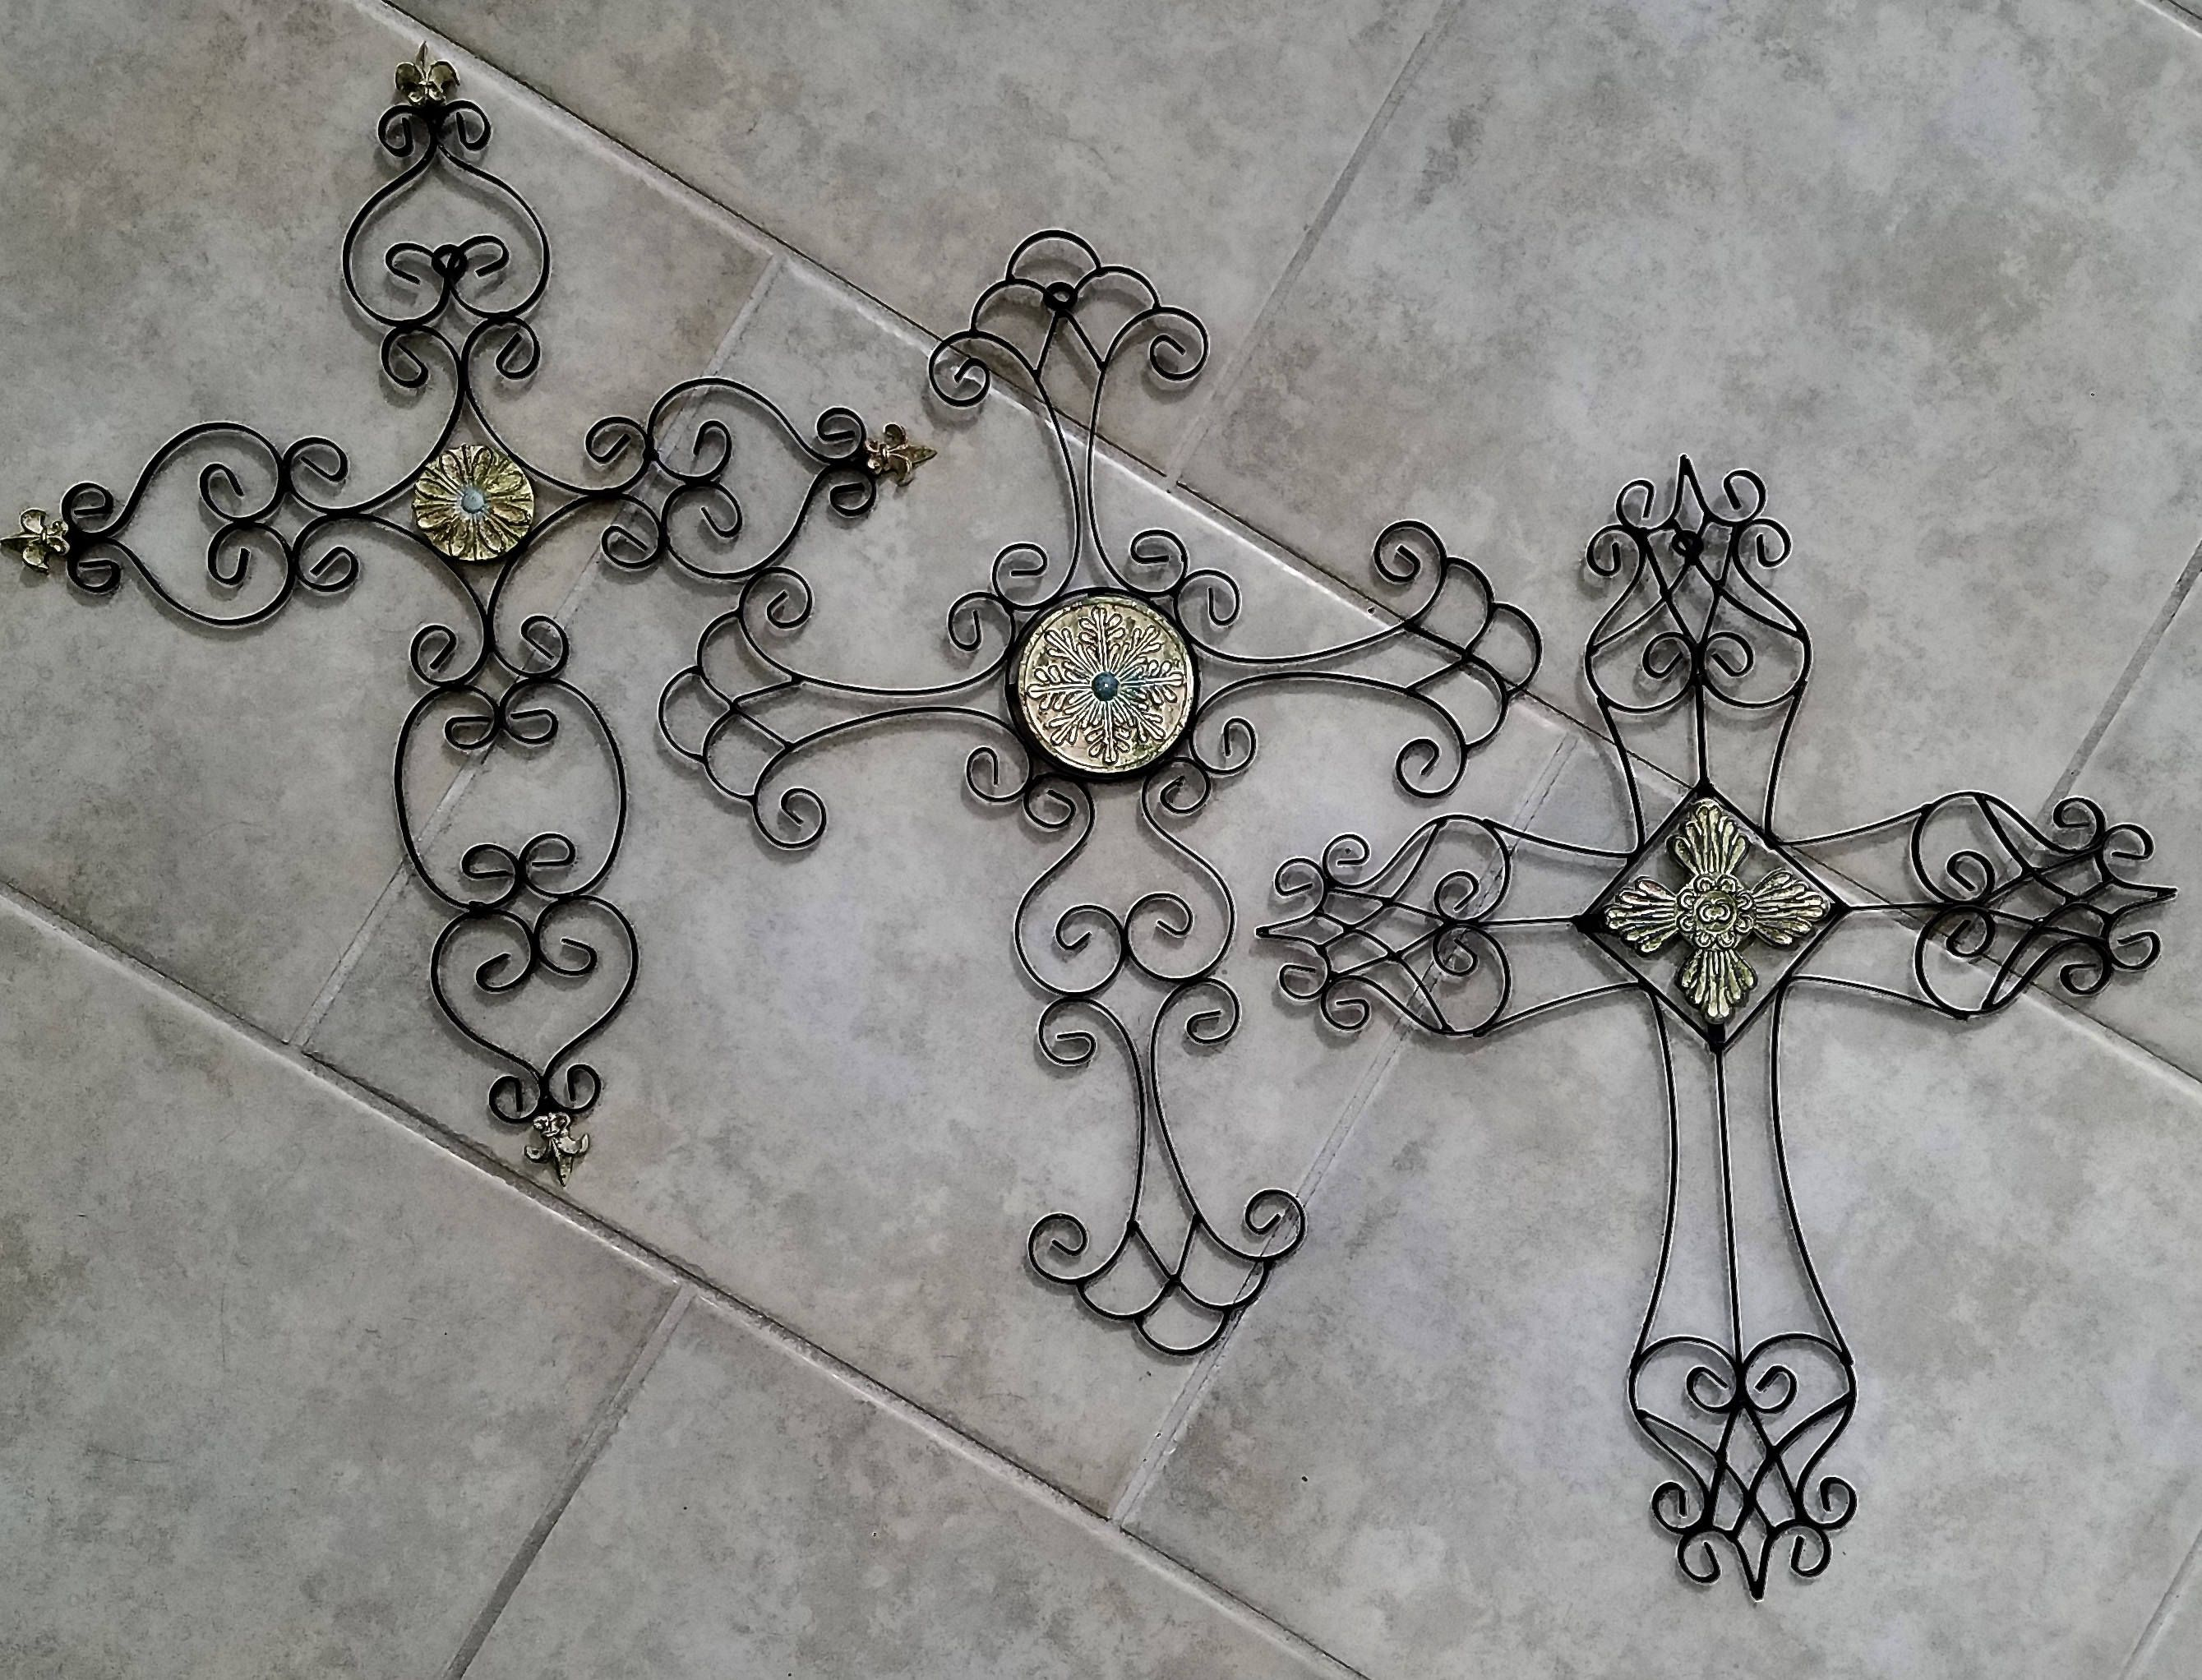 ornate celtic crosses home decor 3 large metal wall crosses